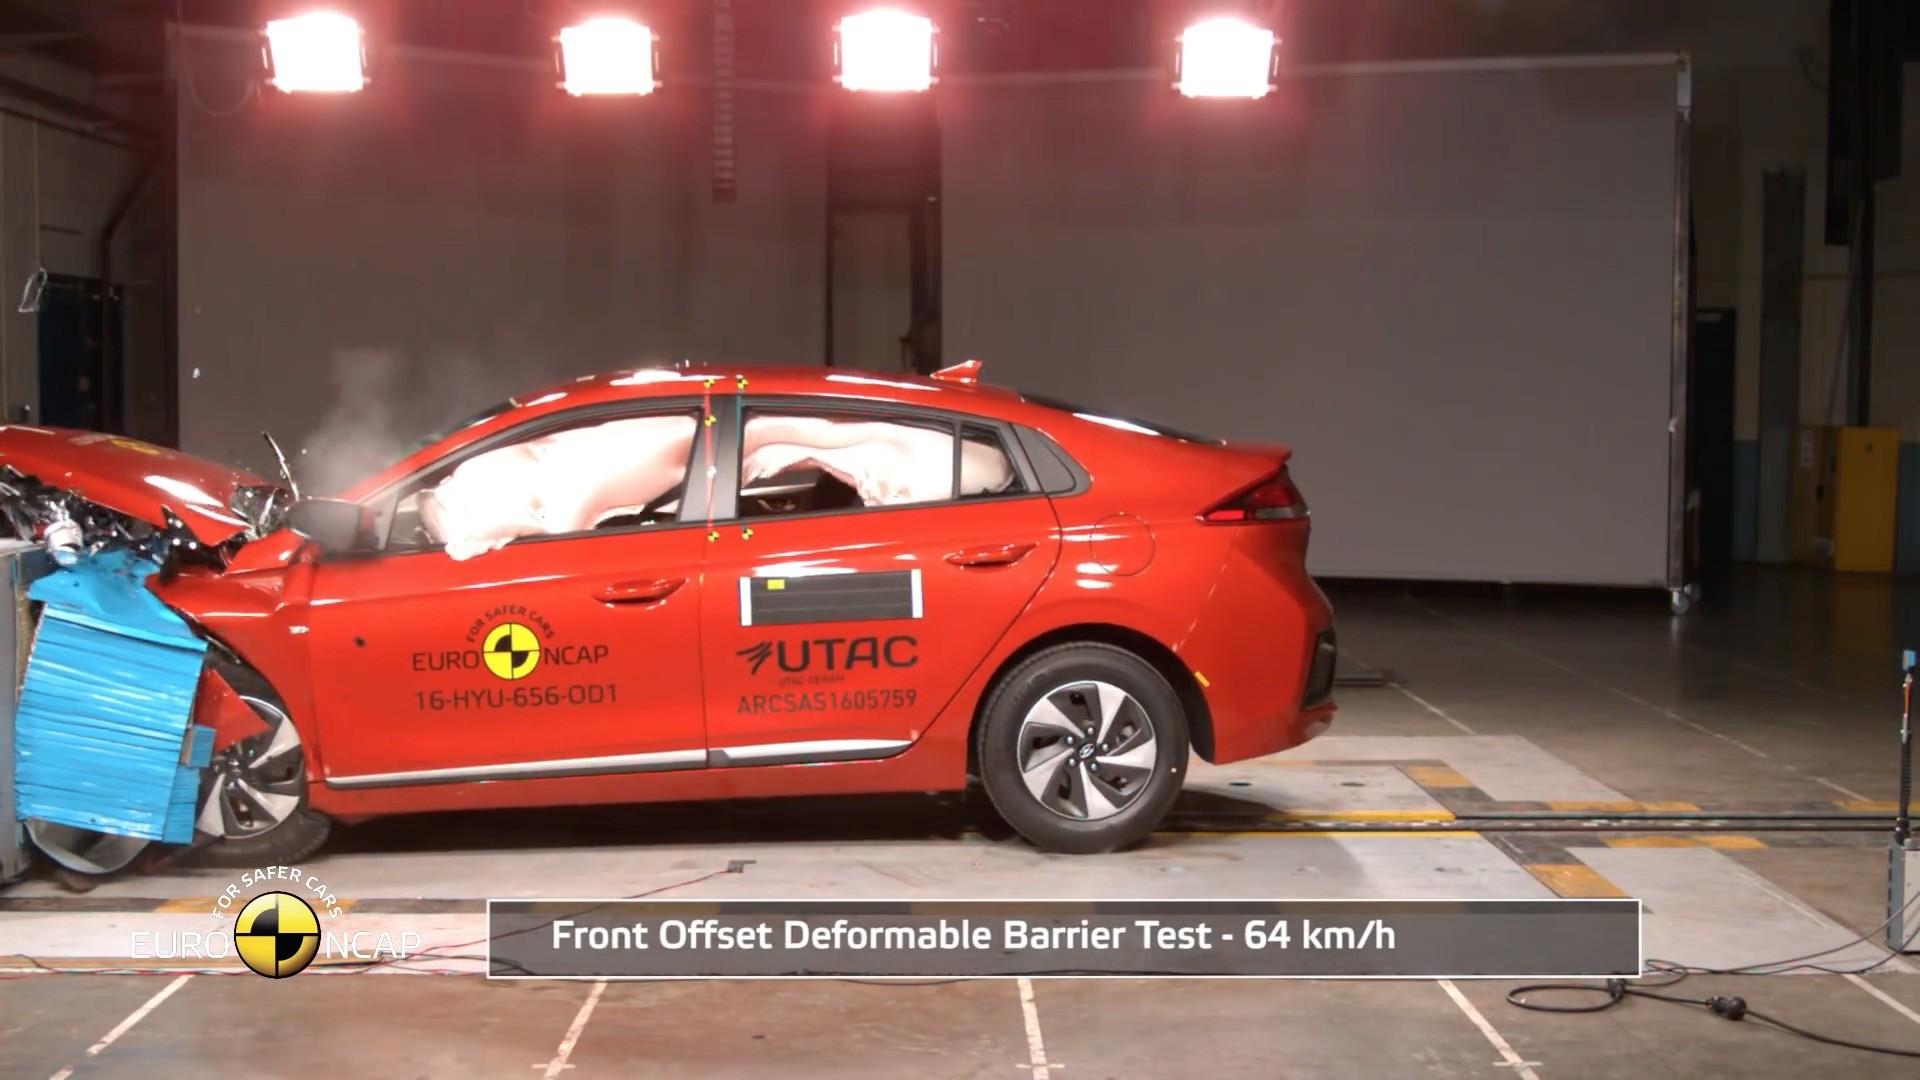 Euro NCAP Crash Test Hyundai Ioniq Praised With 5 Star Safety